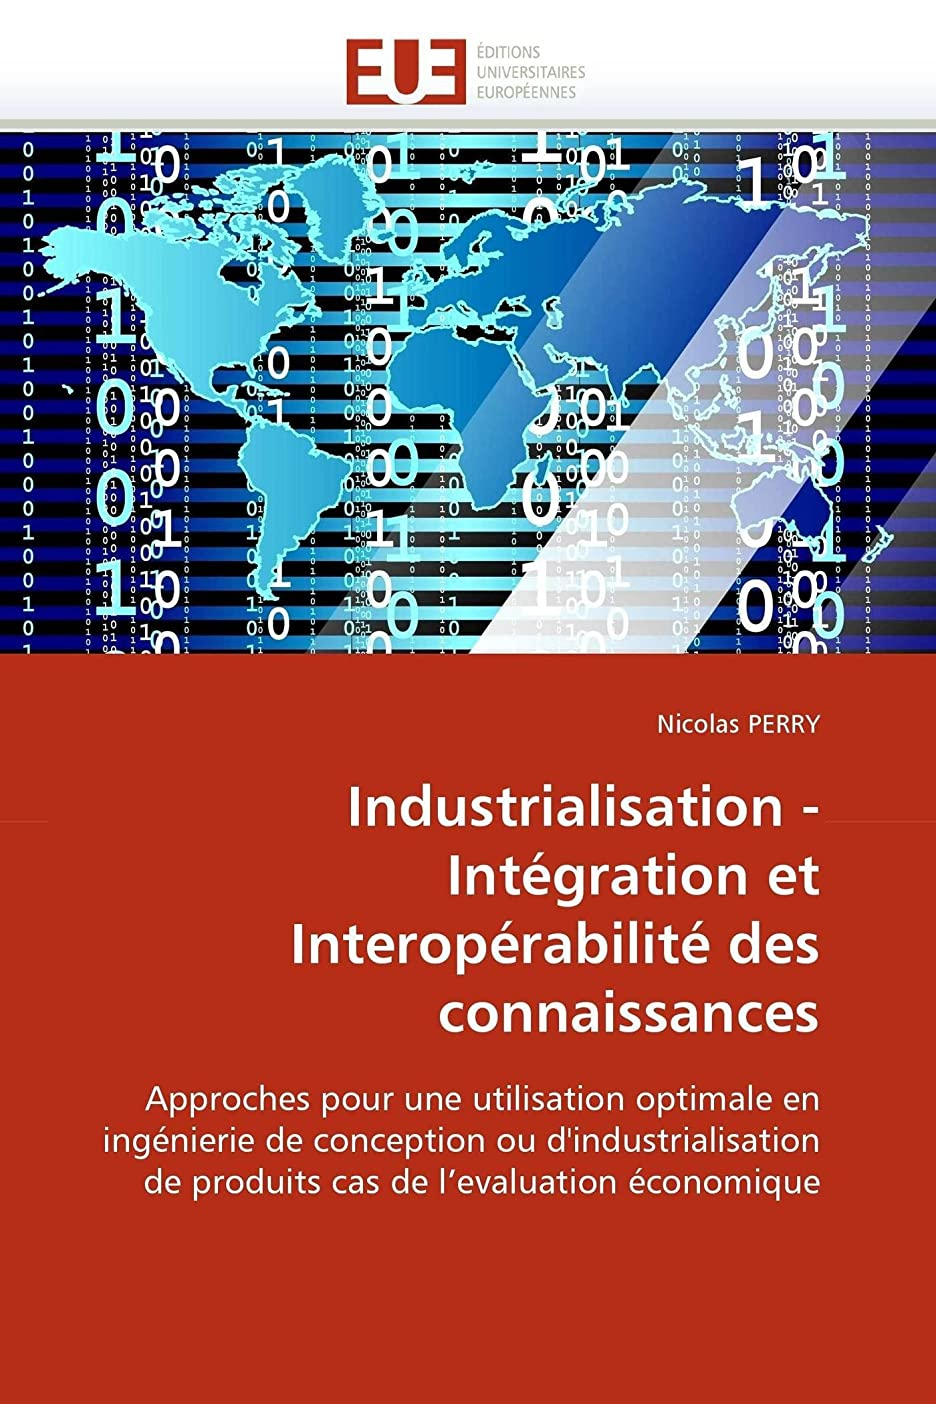 到着する家圧縮Industrialisation - Intégration Et Interopérabilité Des Connaissances (Omn.Univ.Europ.)